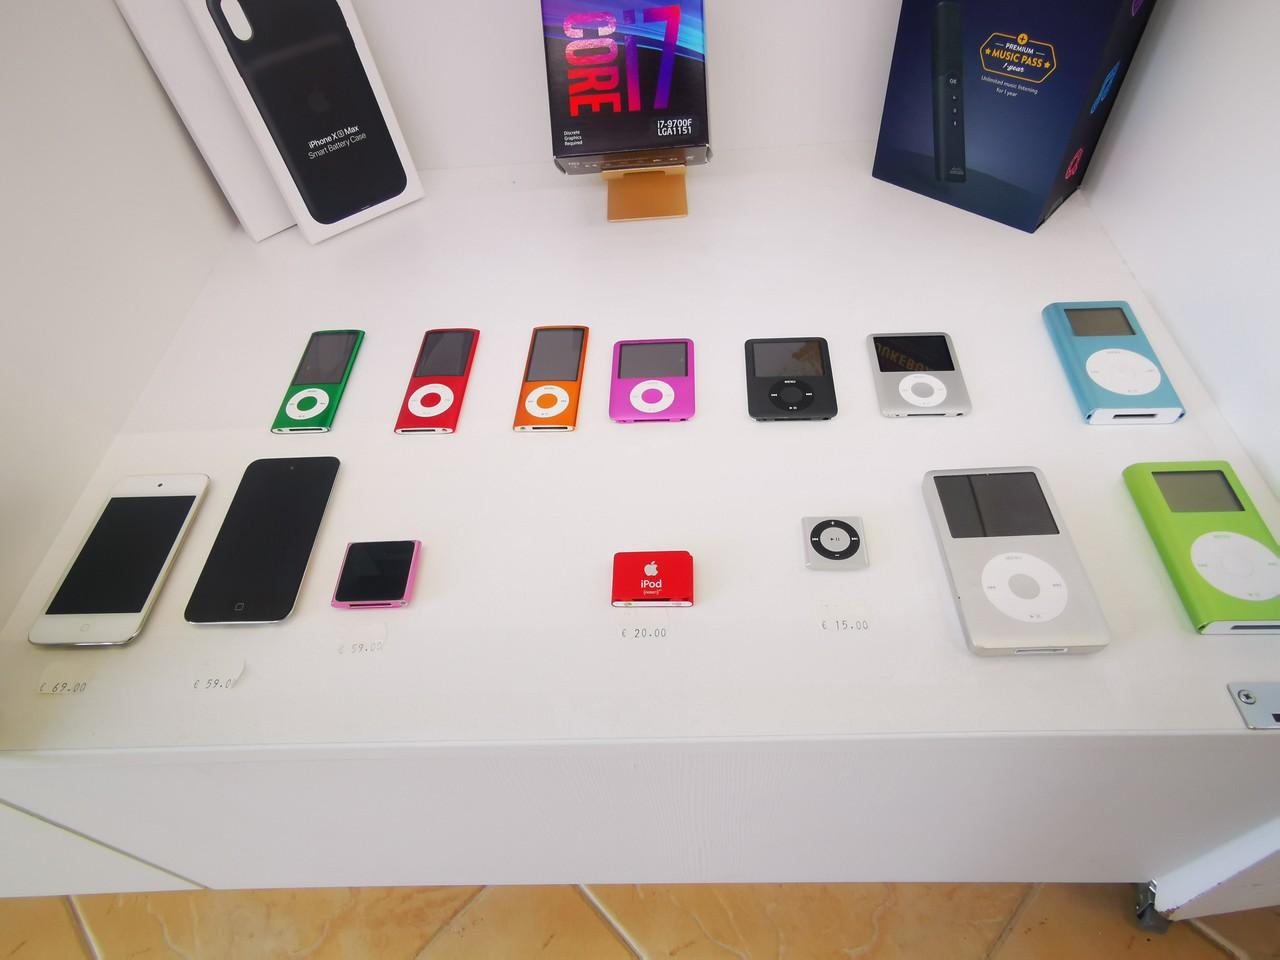 картинка Naudoti Apple iPod Vilnius от магазина Одежда+